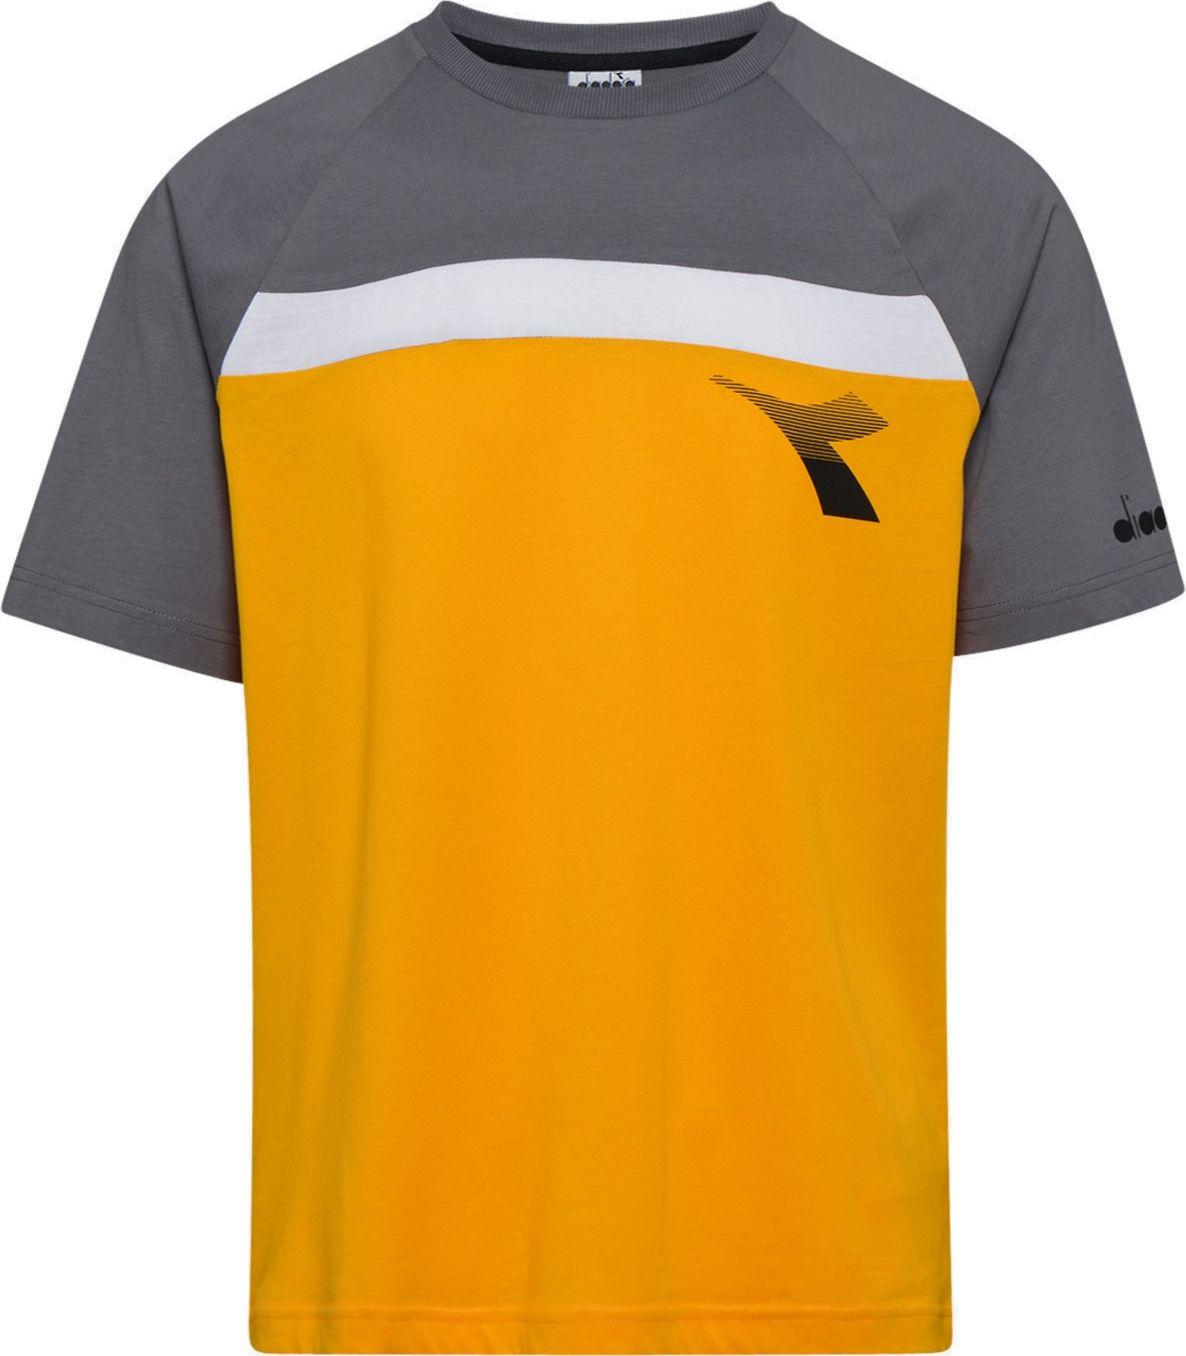 DIADORA T-Shirt SS Club Yellow Saffron L